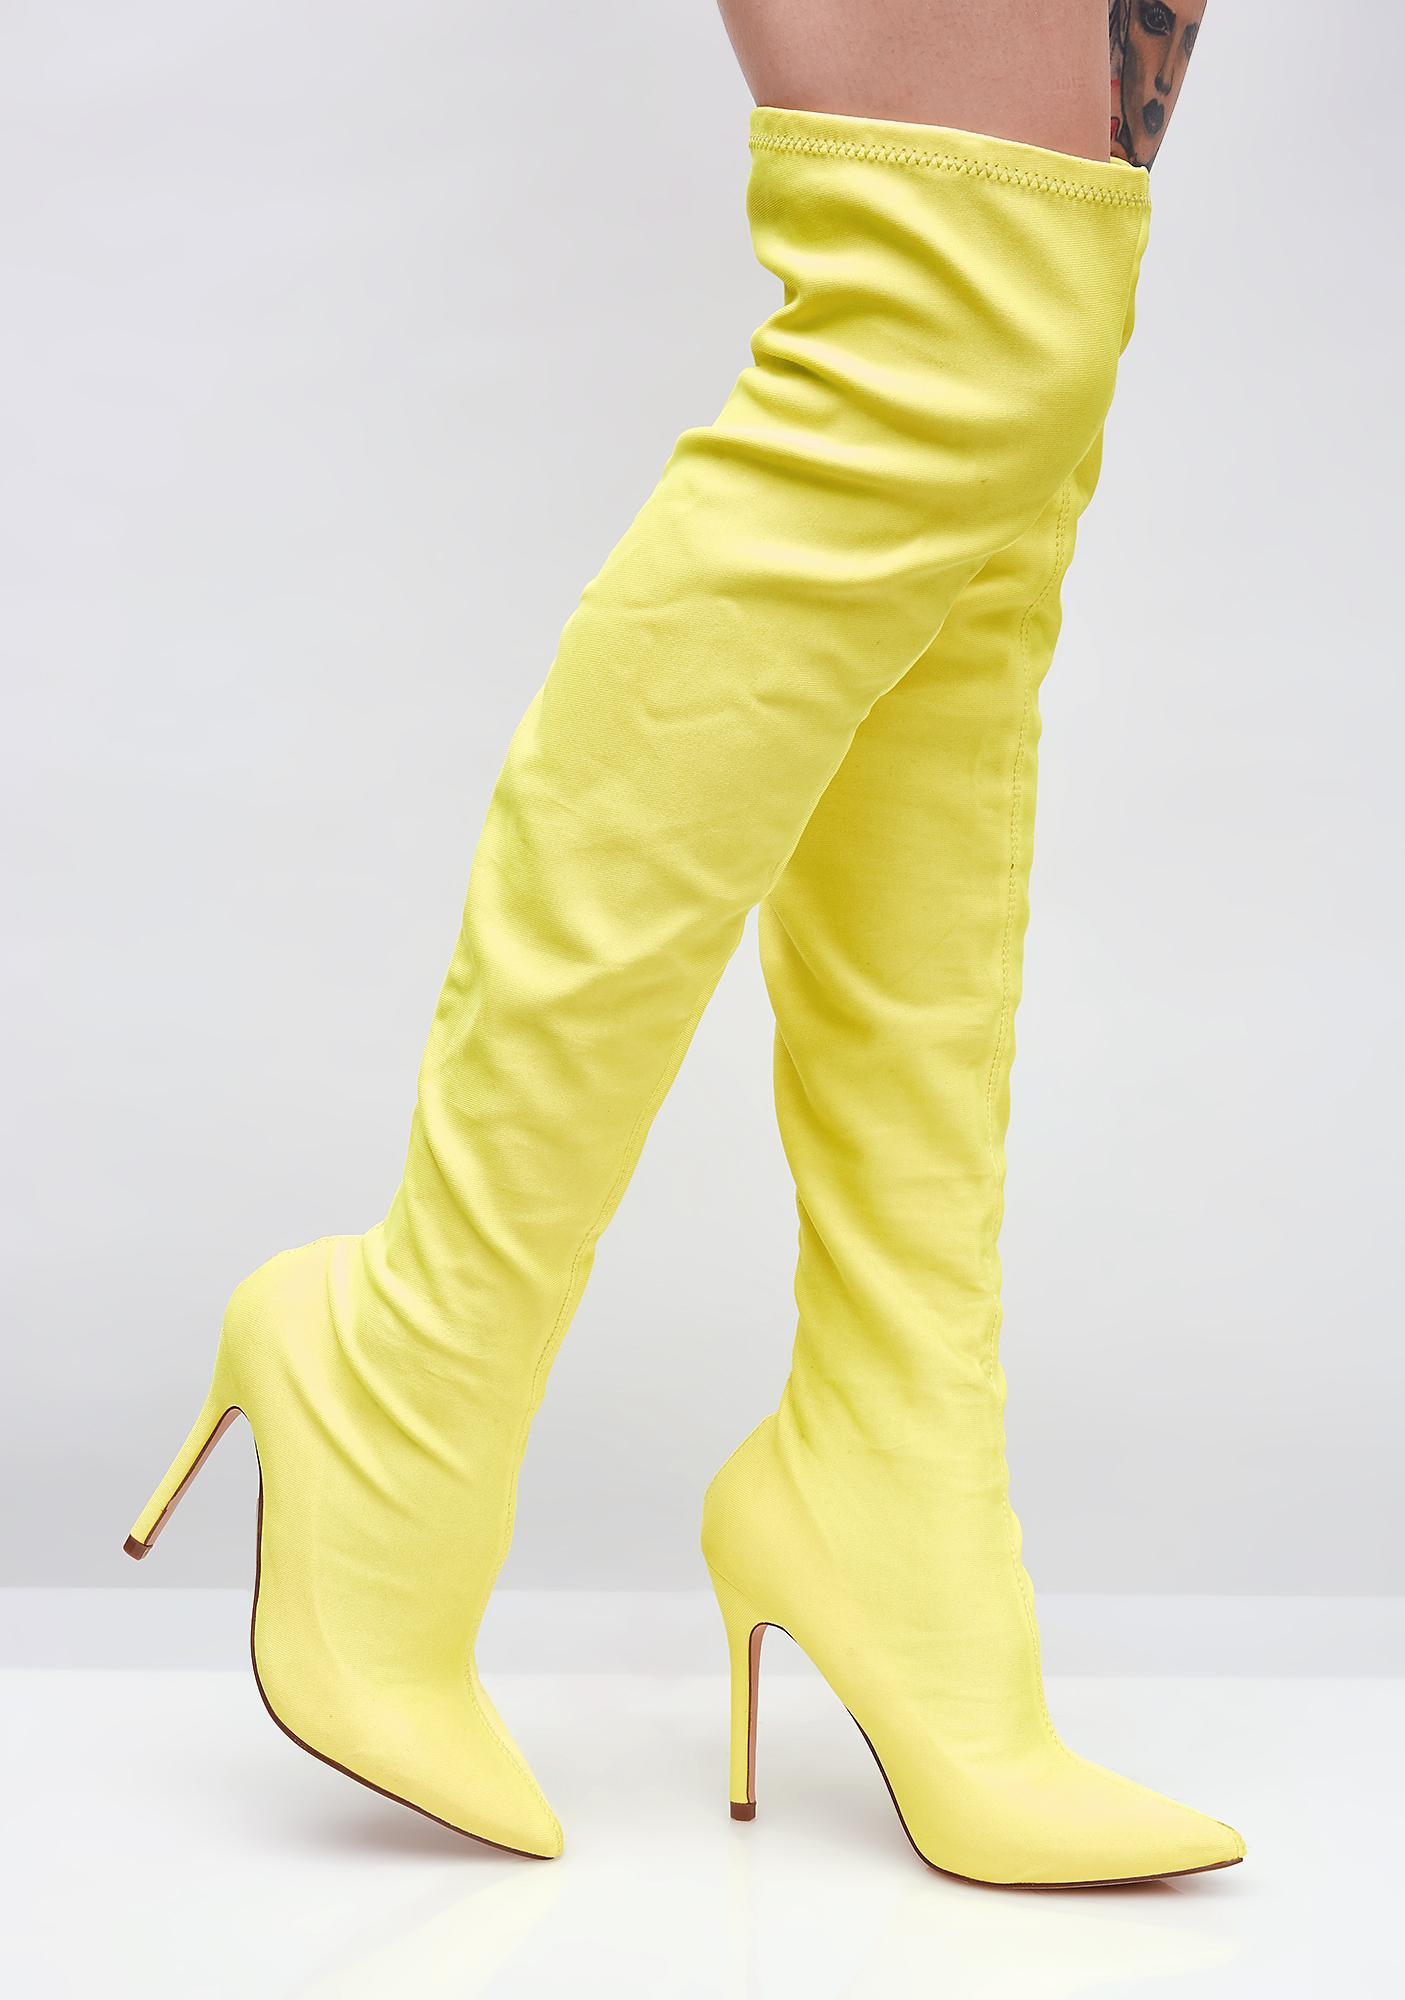 Keep Lookin' Over The Knee Boots